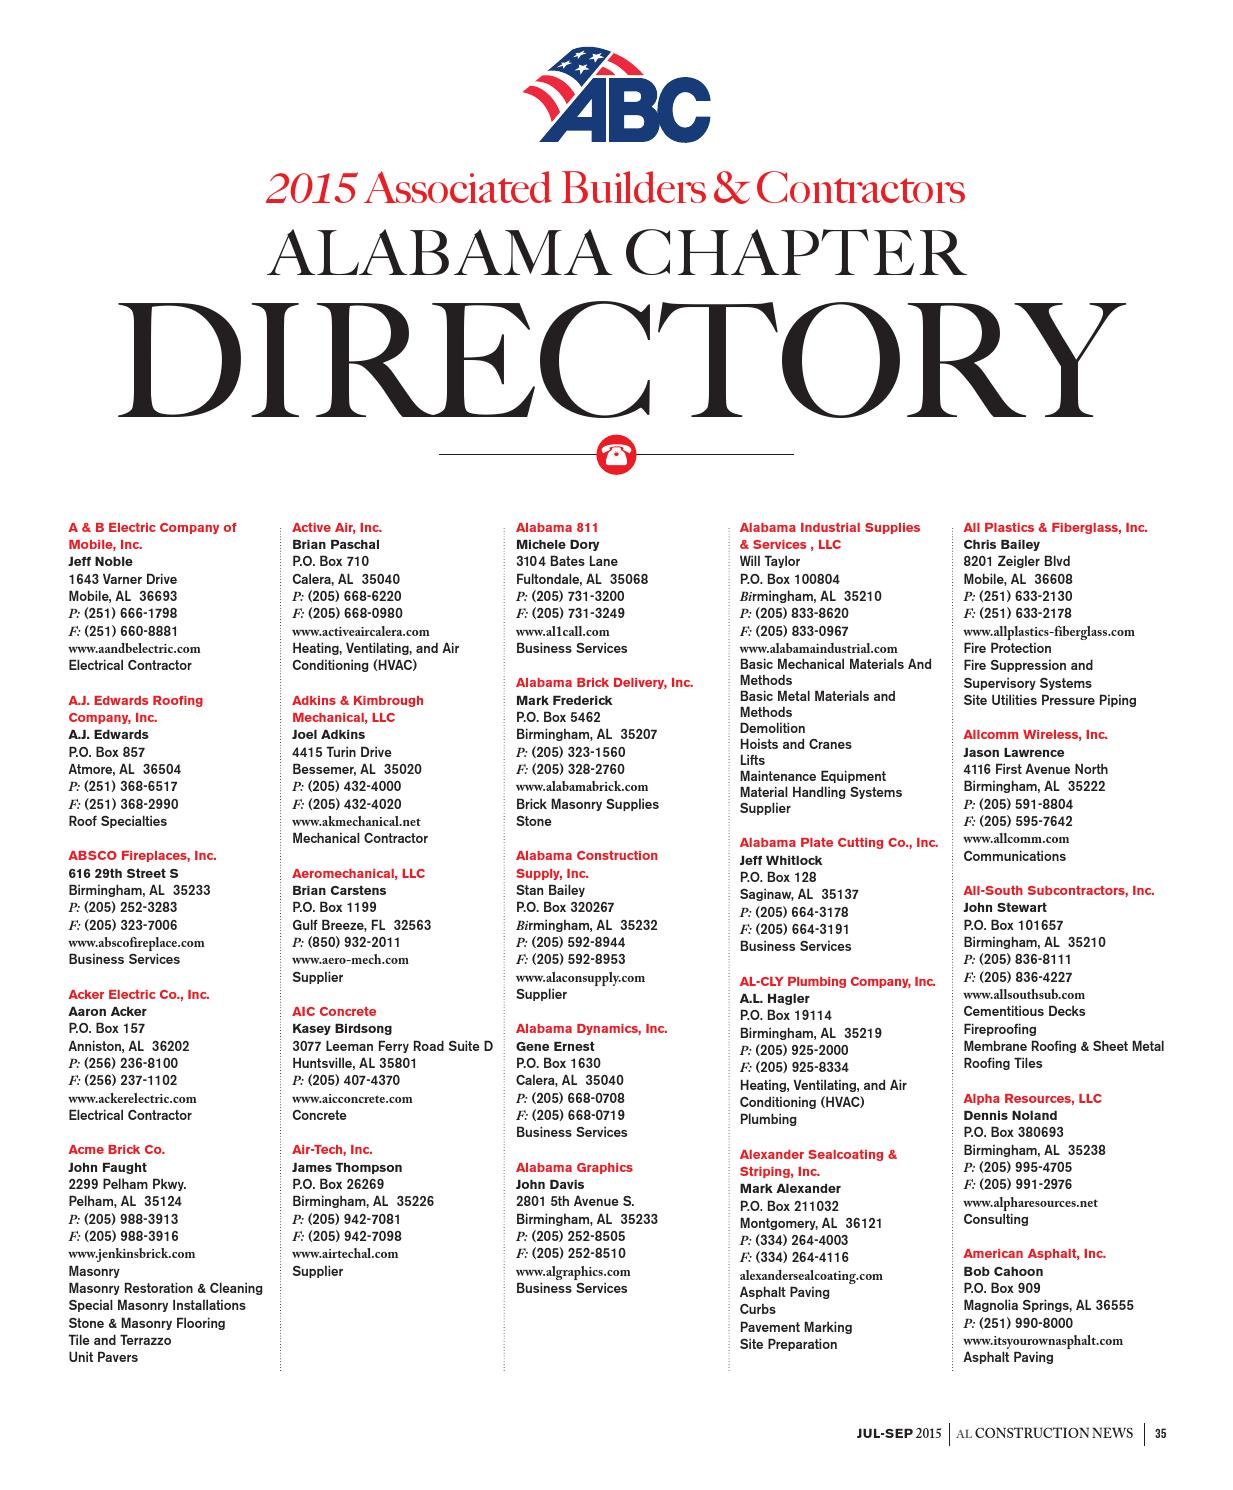 Alabama Construction News Magazine Q3 2015 By Abc Of